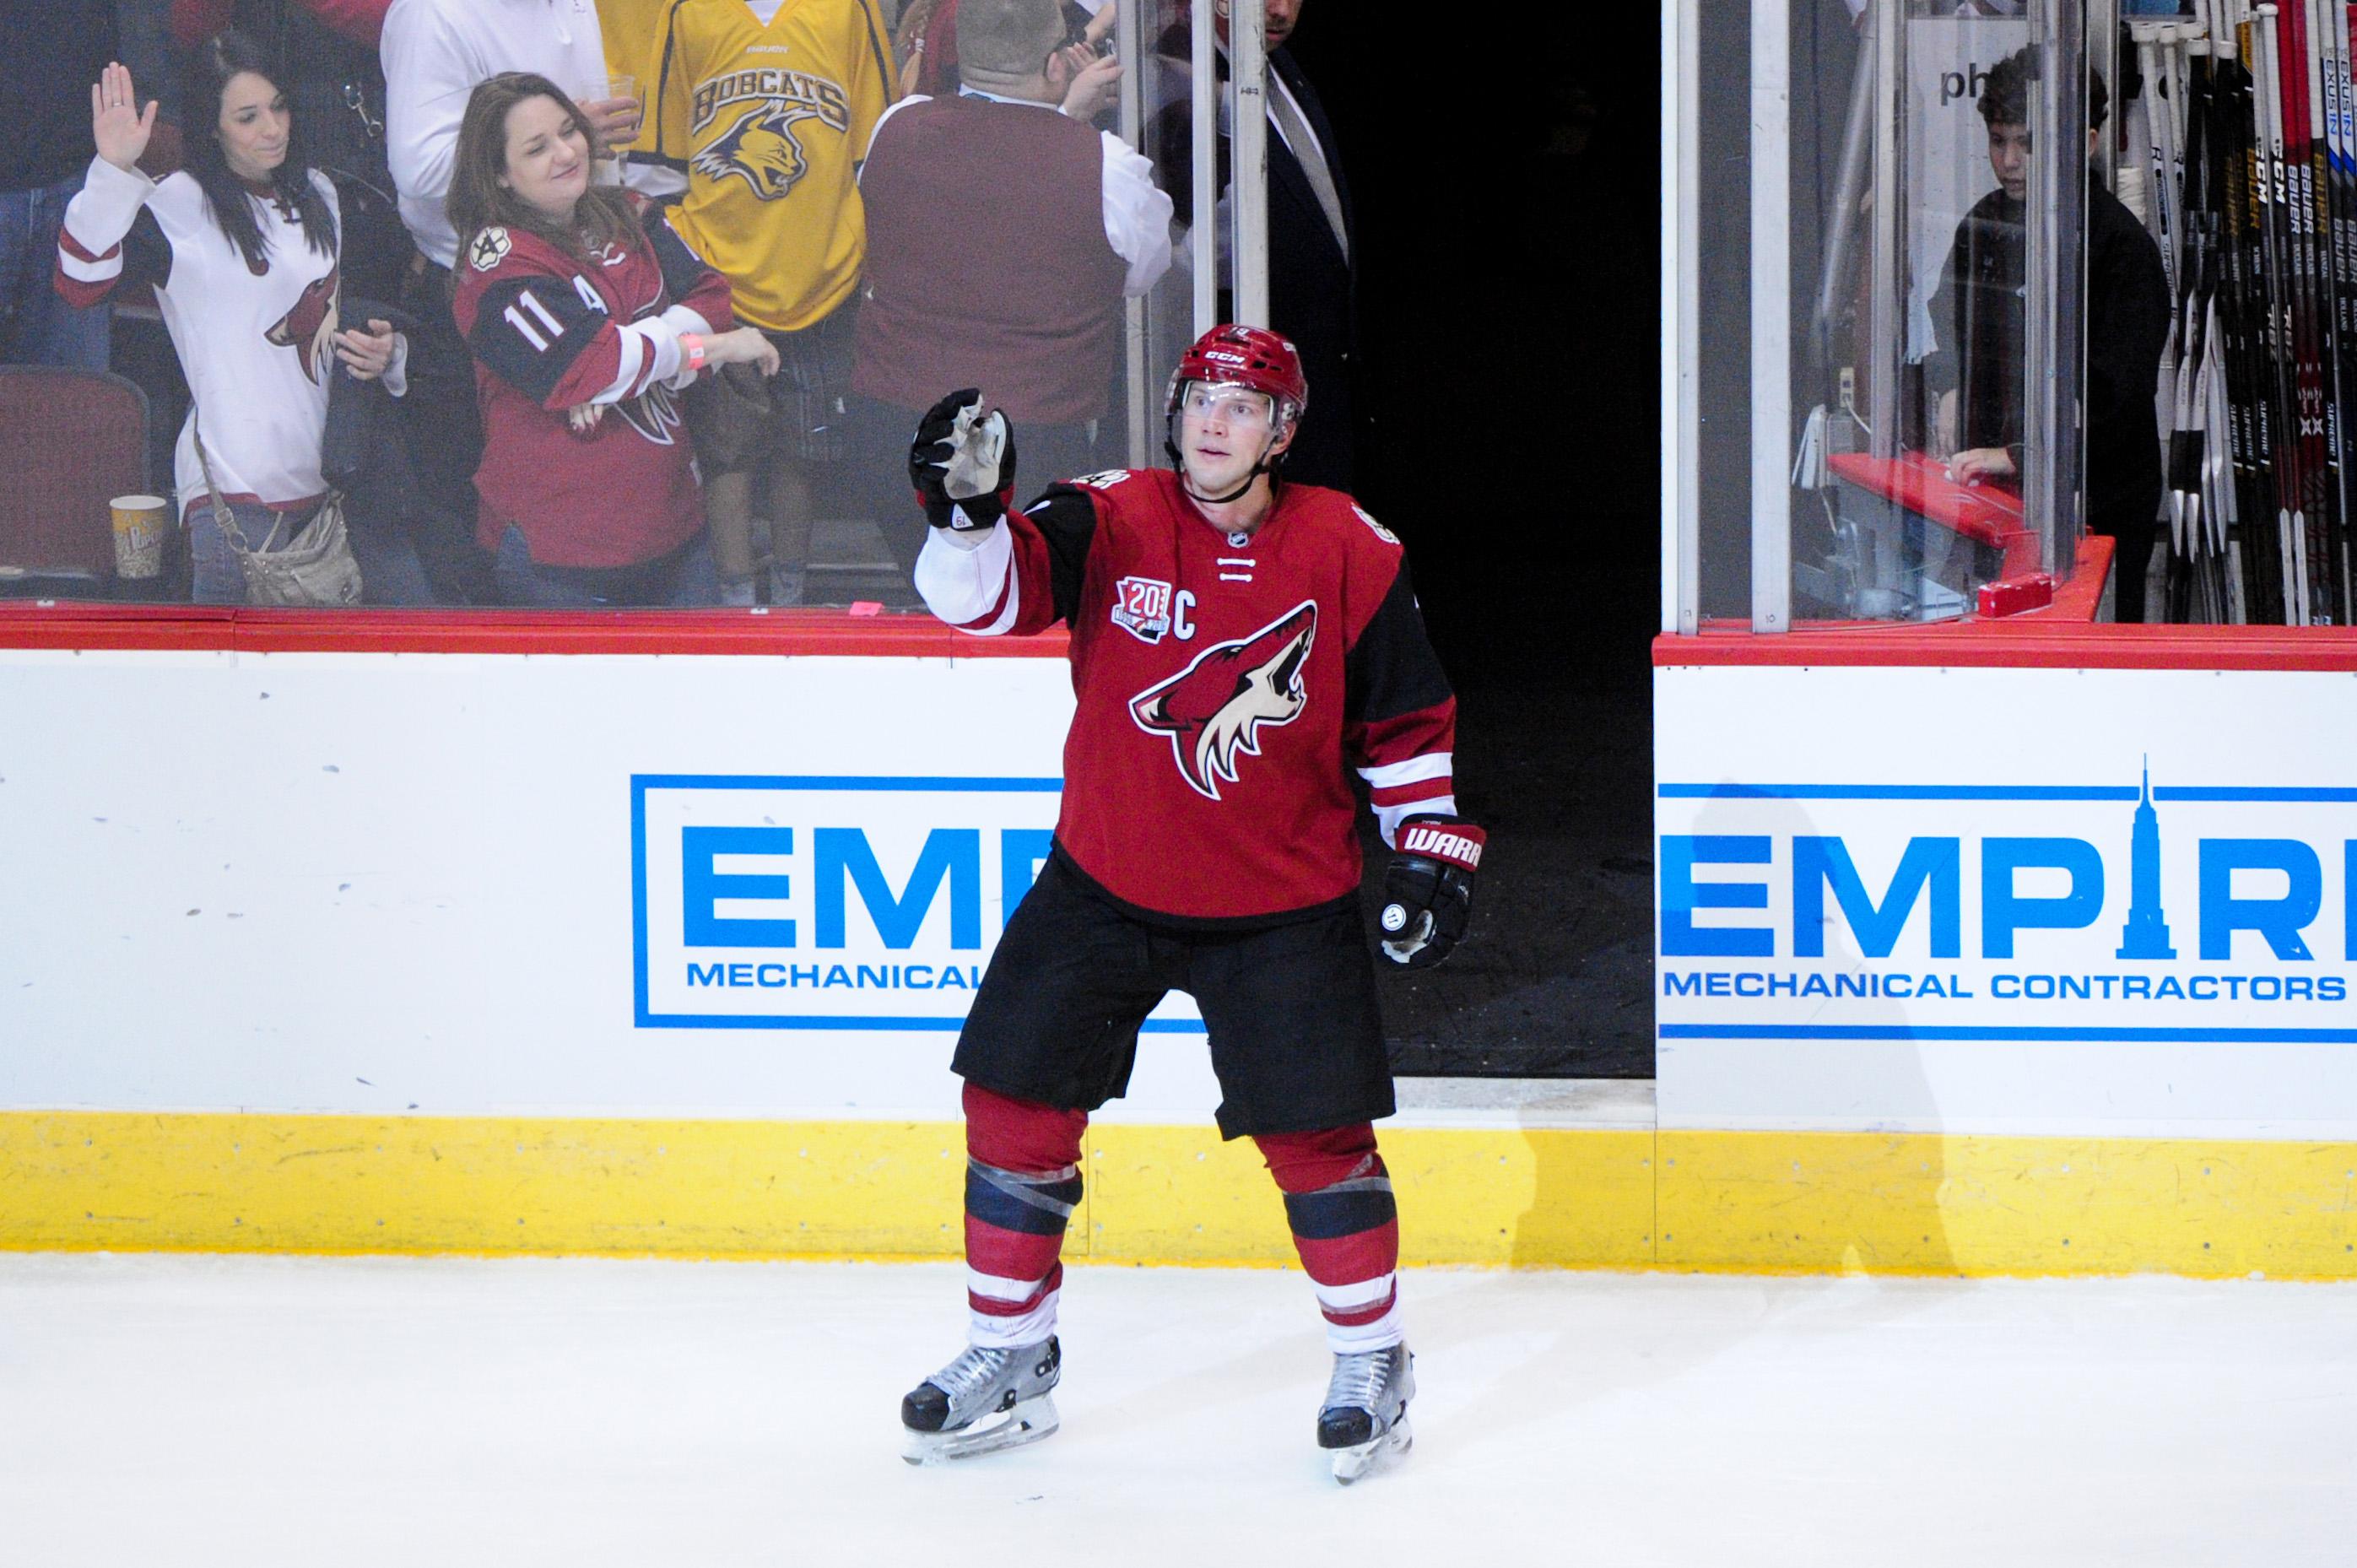 NHL: Toronto Maple Leafs at Arizona Coyotes